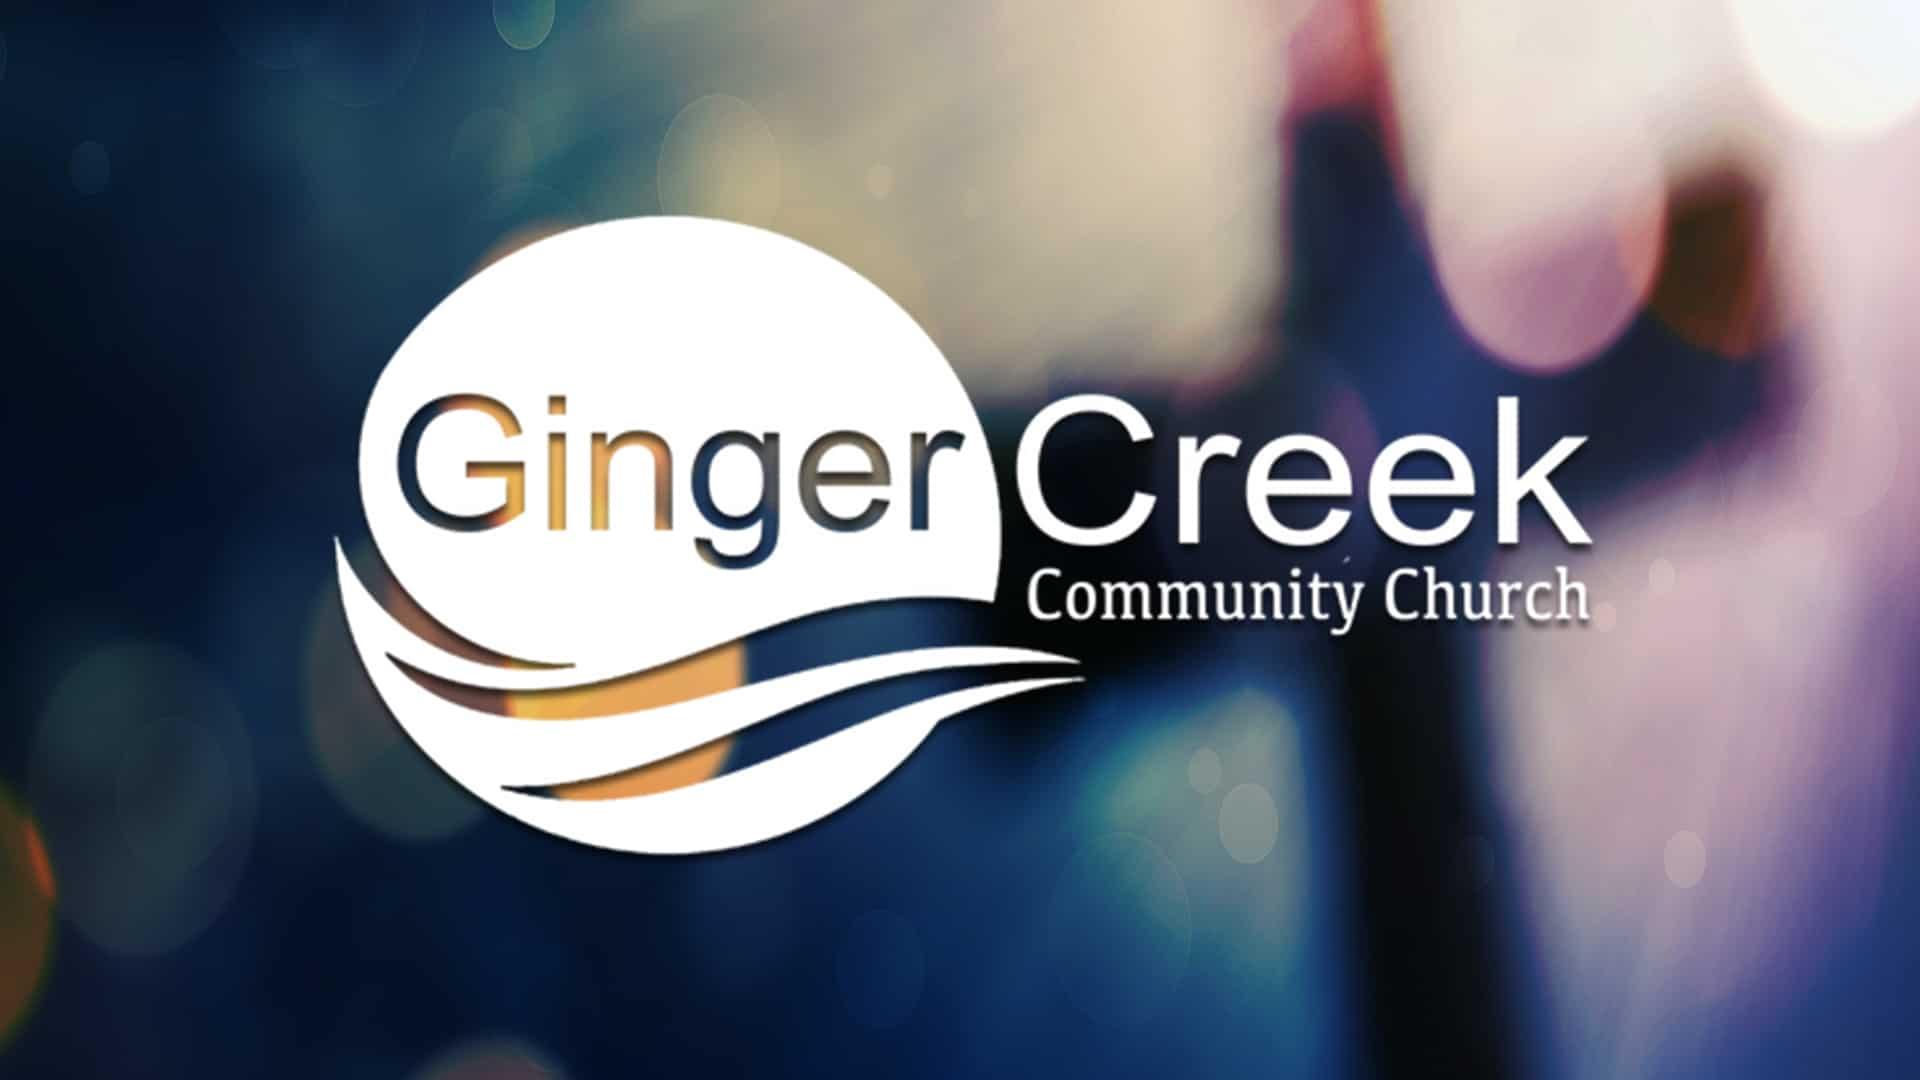 Ginger Creek Community Church